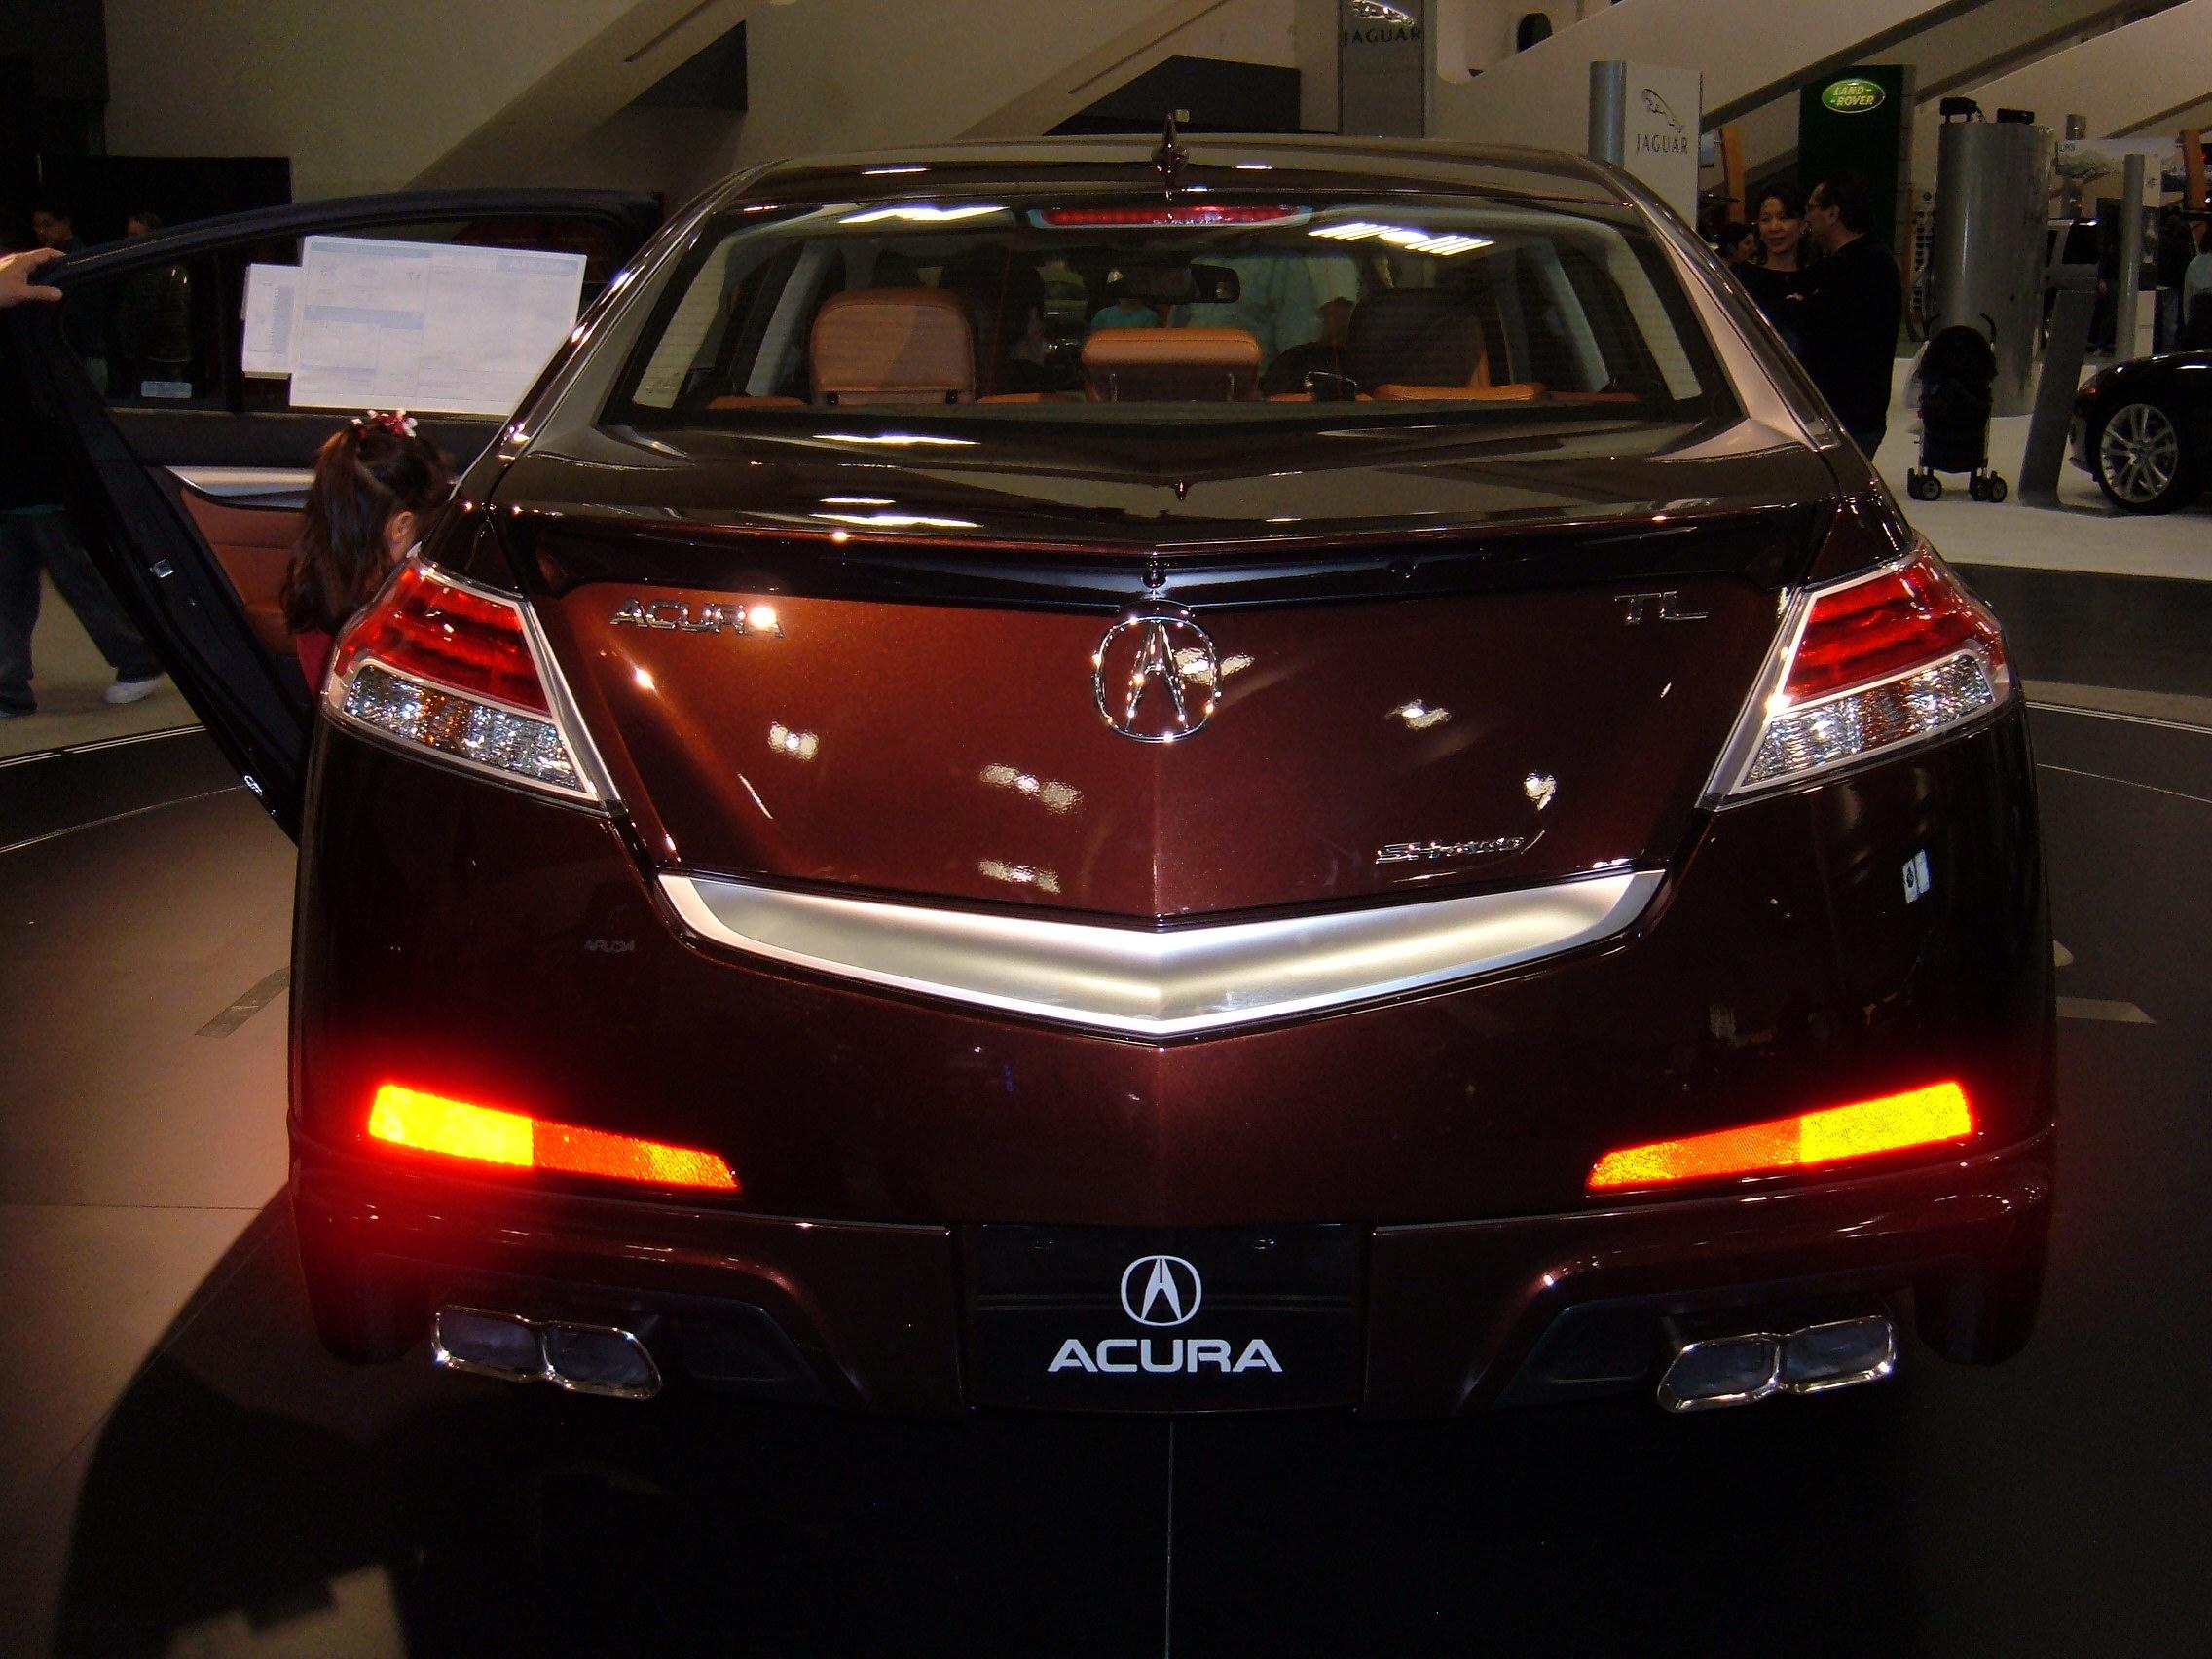 File:2009 maroon Acura TL SH-AWD Tech rear.JPG - Wikimedia Commons